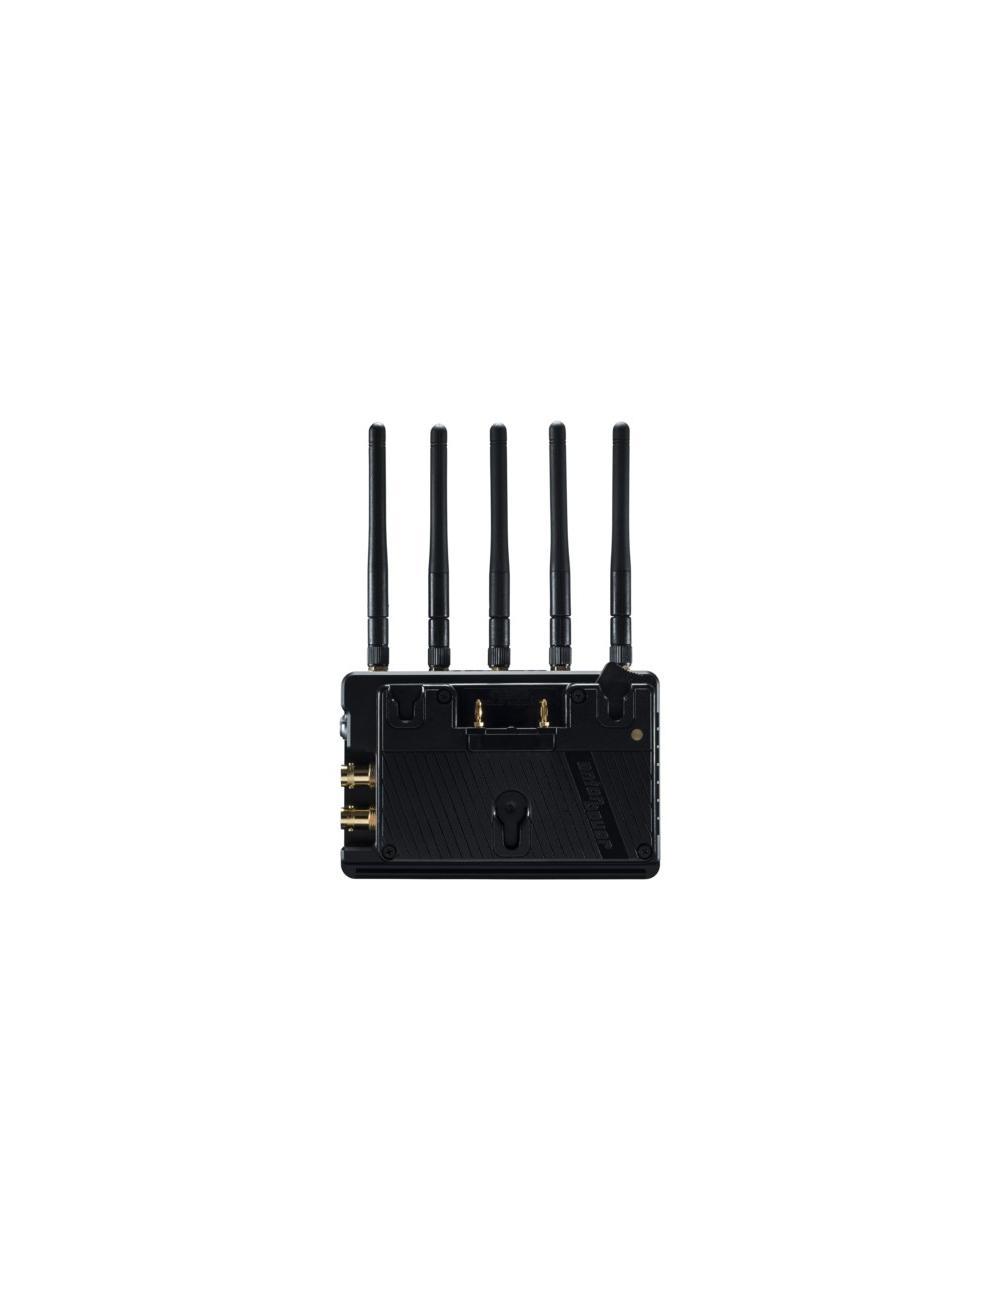 Teradek Bolt 1000 XT SDI/HDMI Wireless RX Pass-Through Battery Plates